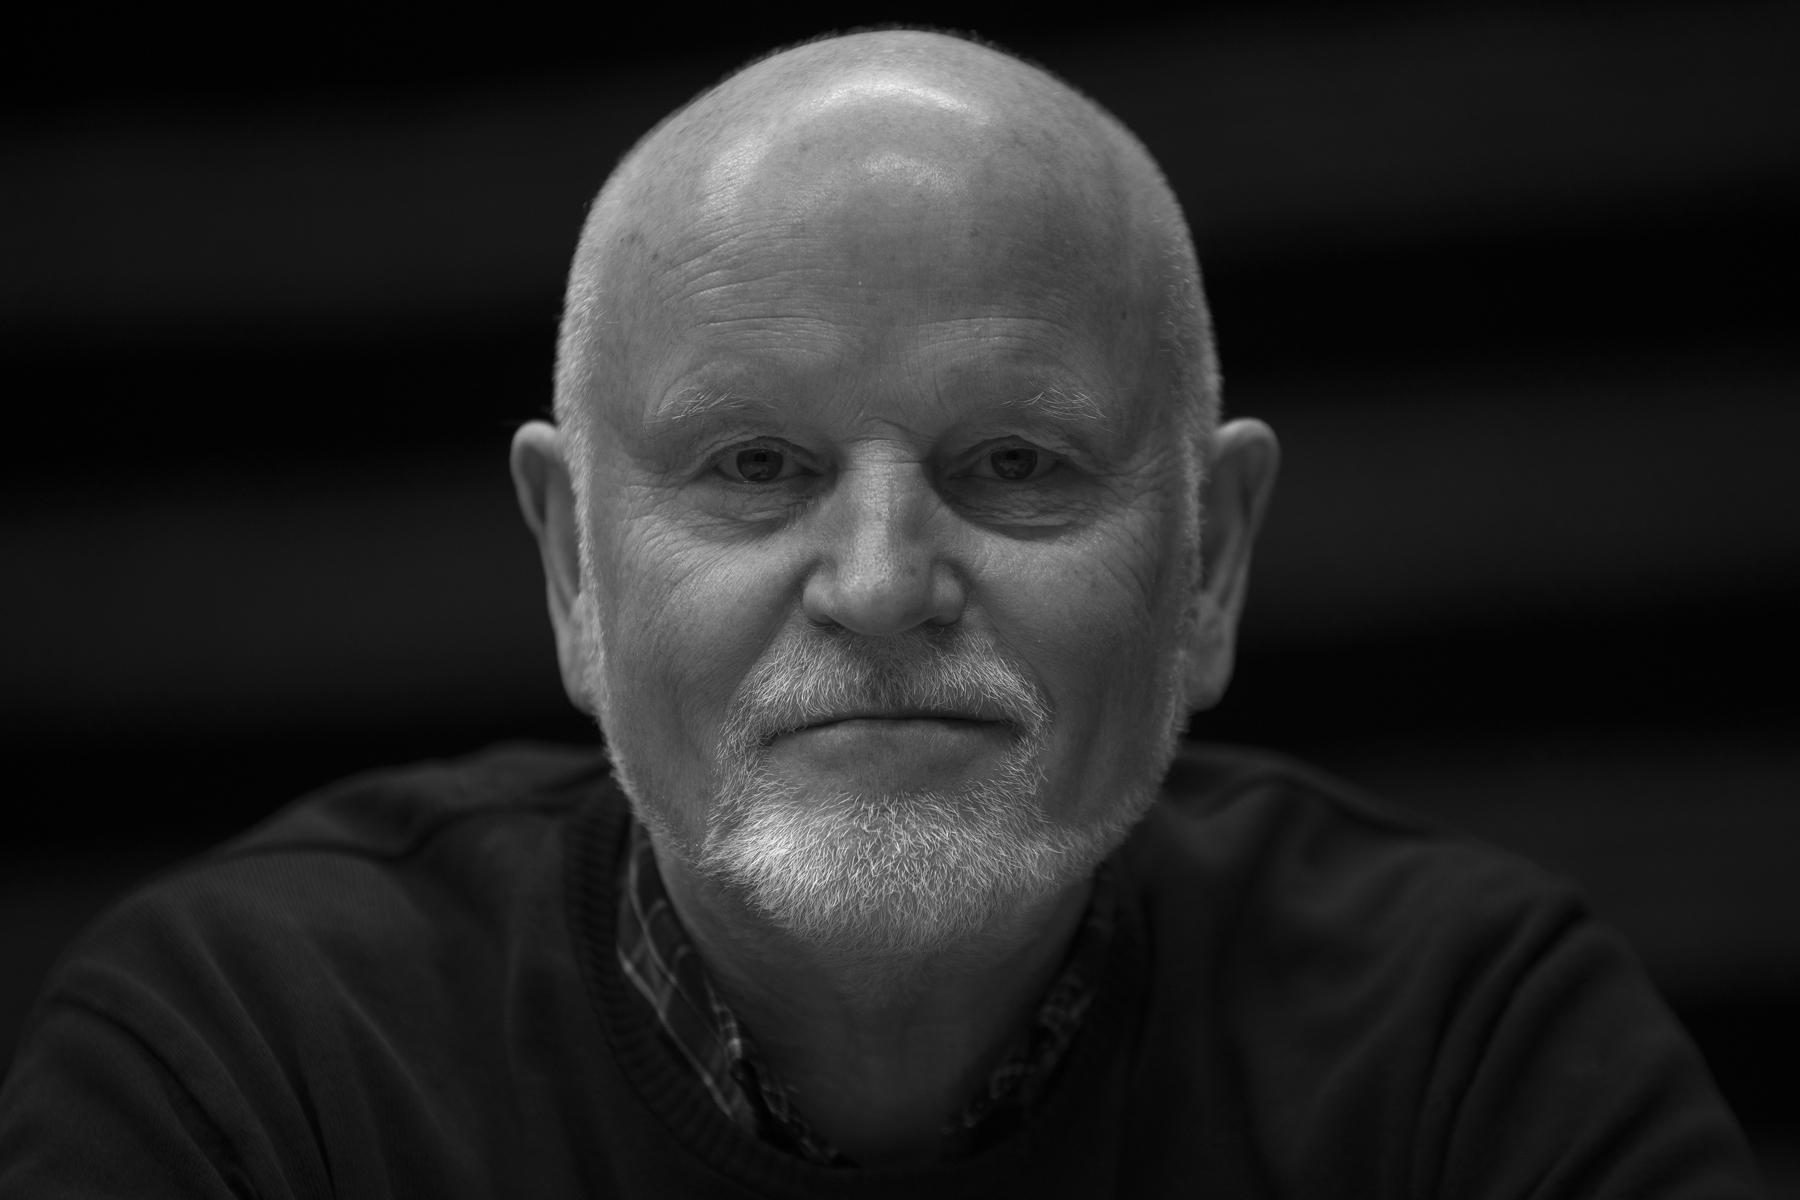 Prof. Dr. Svein Jentoft : [staff-                     position]